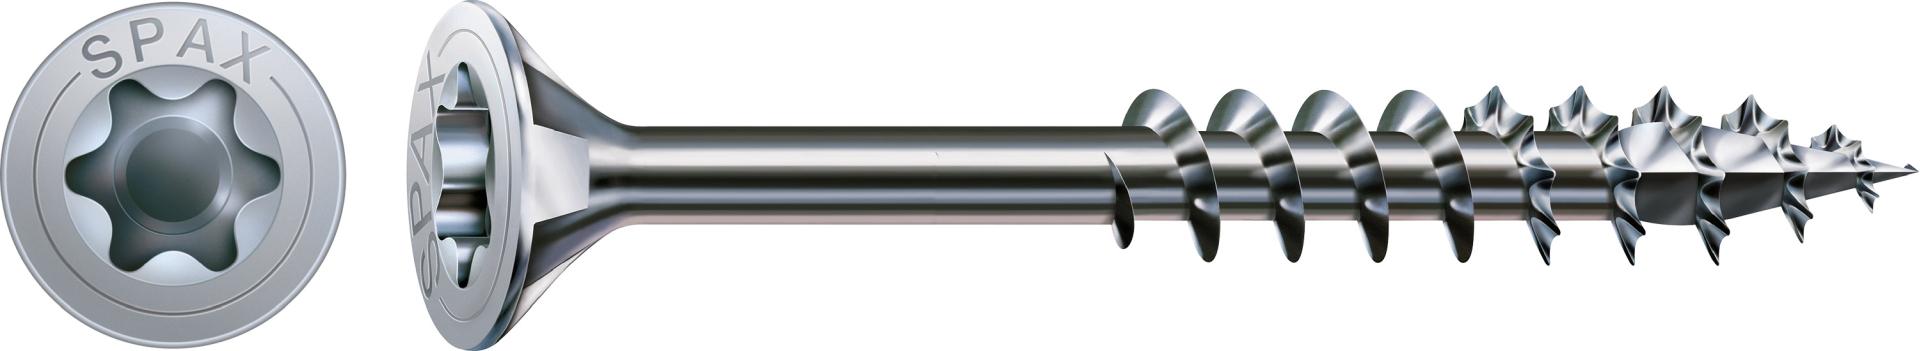 SPAX Universalschraube, Teilgewinde, Senkkopf, T-STAR plus T30, 4CUT, WIROX, 6 x 140 mm, 100 Stück